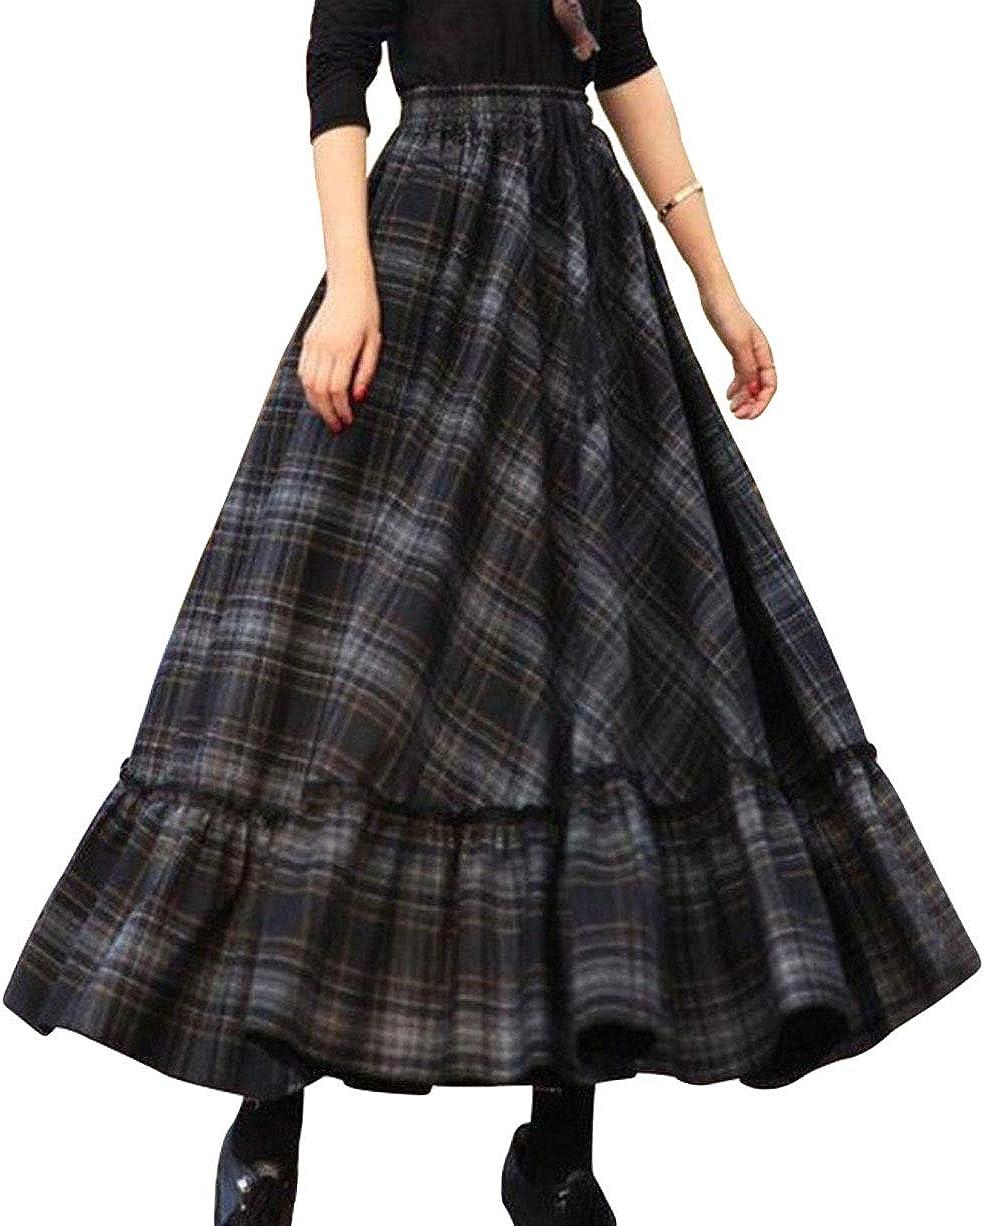 CHARTOU Women's Elegant High Waist Plaid Patchwork Pleated Flowy Maxi Swing Skirt